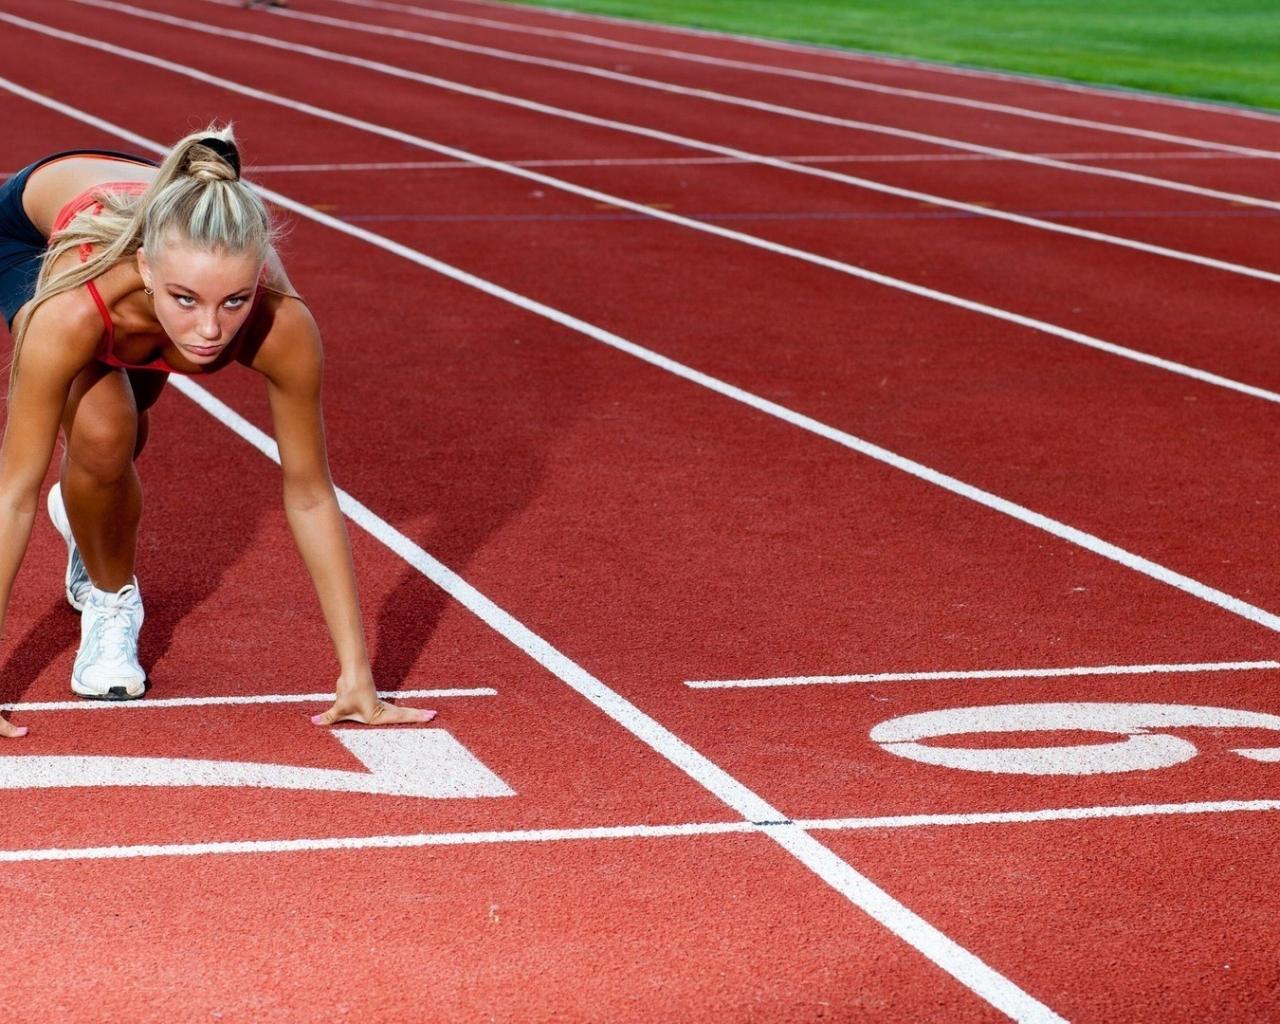 Rubias en atletismo - 1280x1024